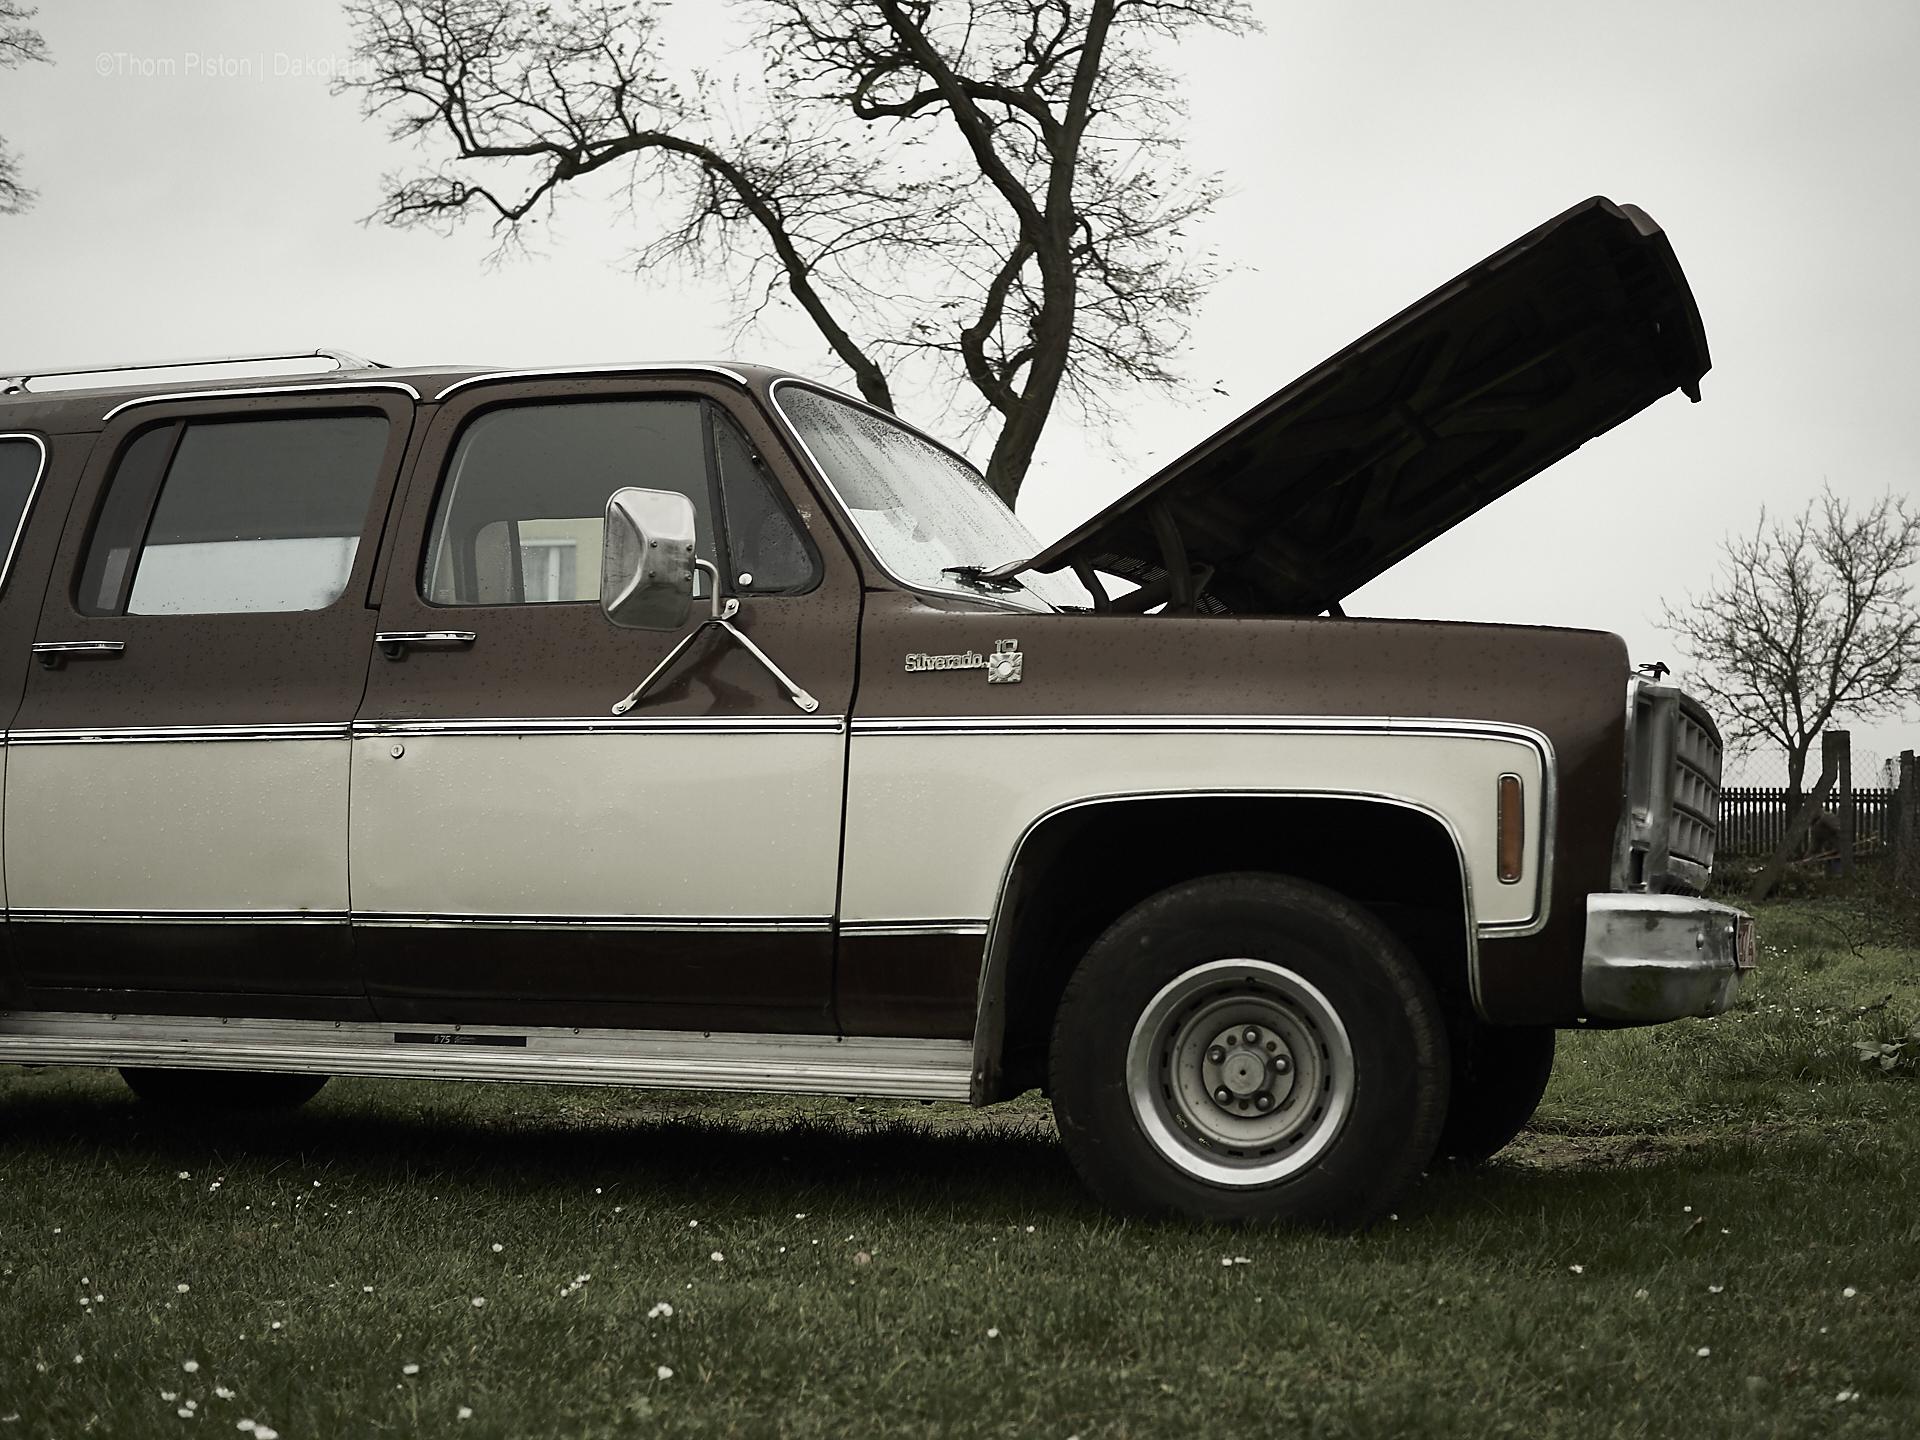 der Dakota Home Truck - 1979 Chevy Suburban